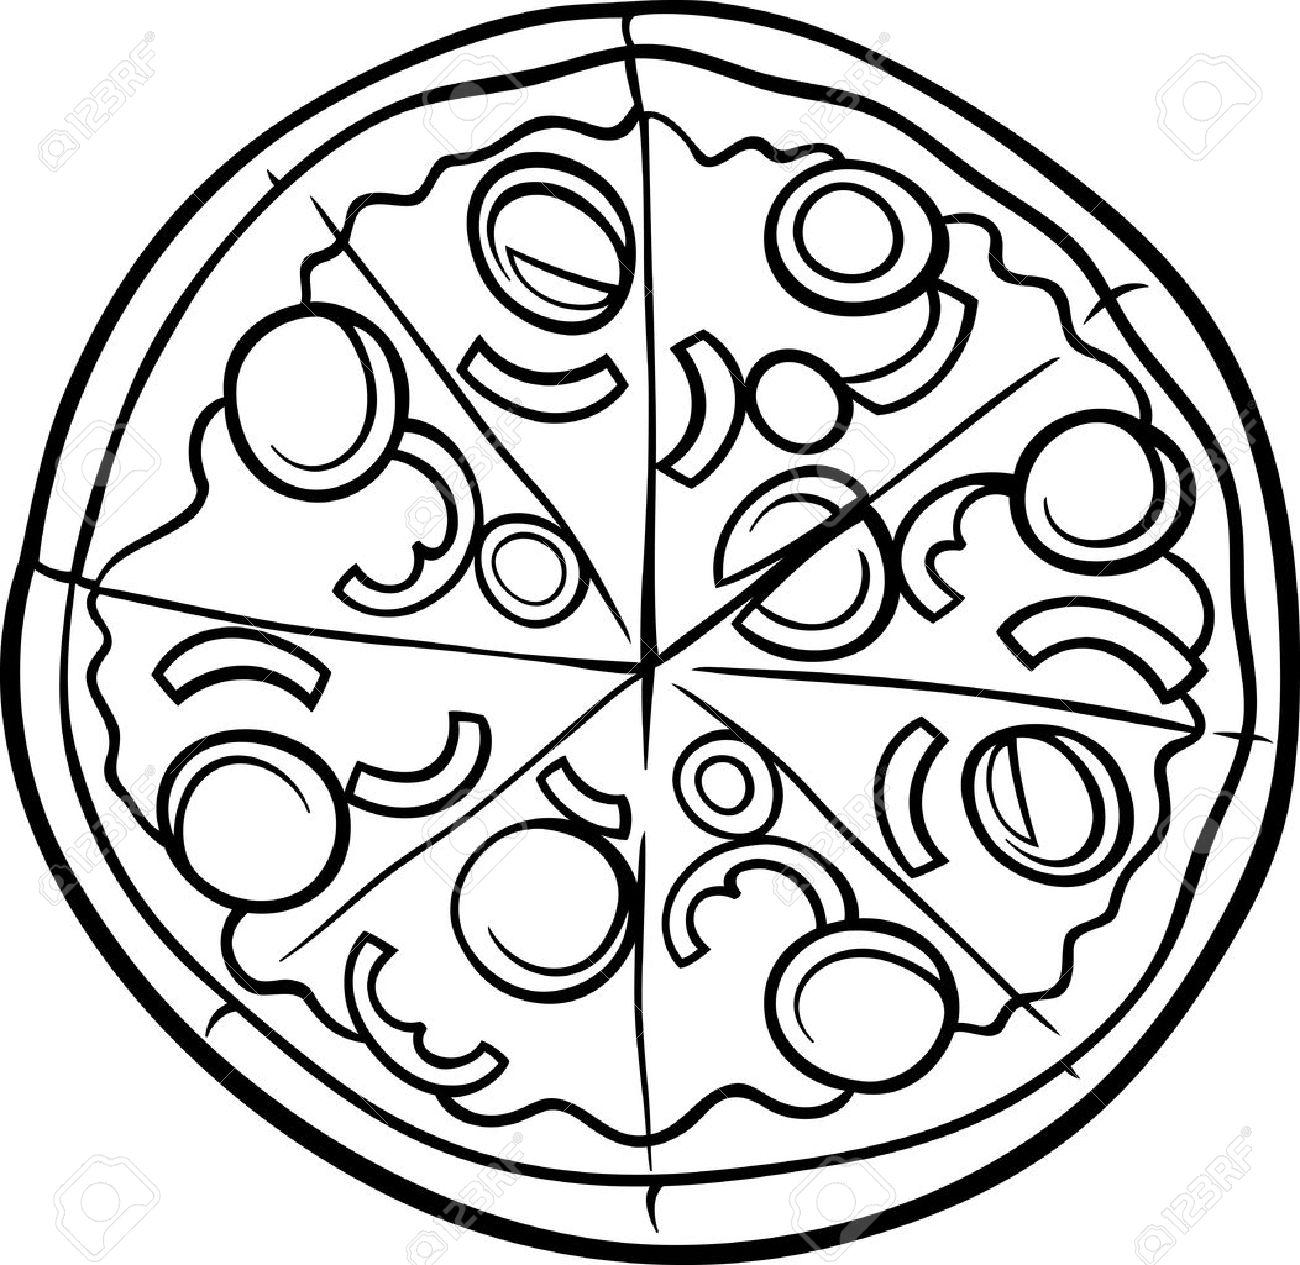 Cartoon Pizza Drawing